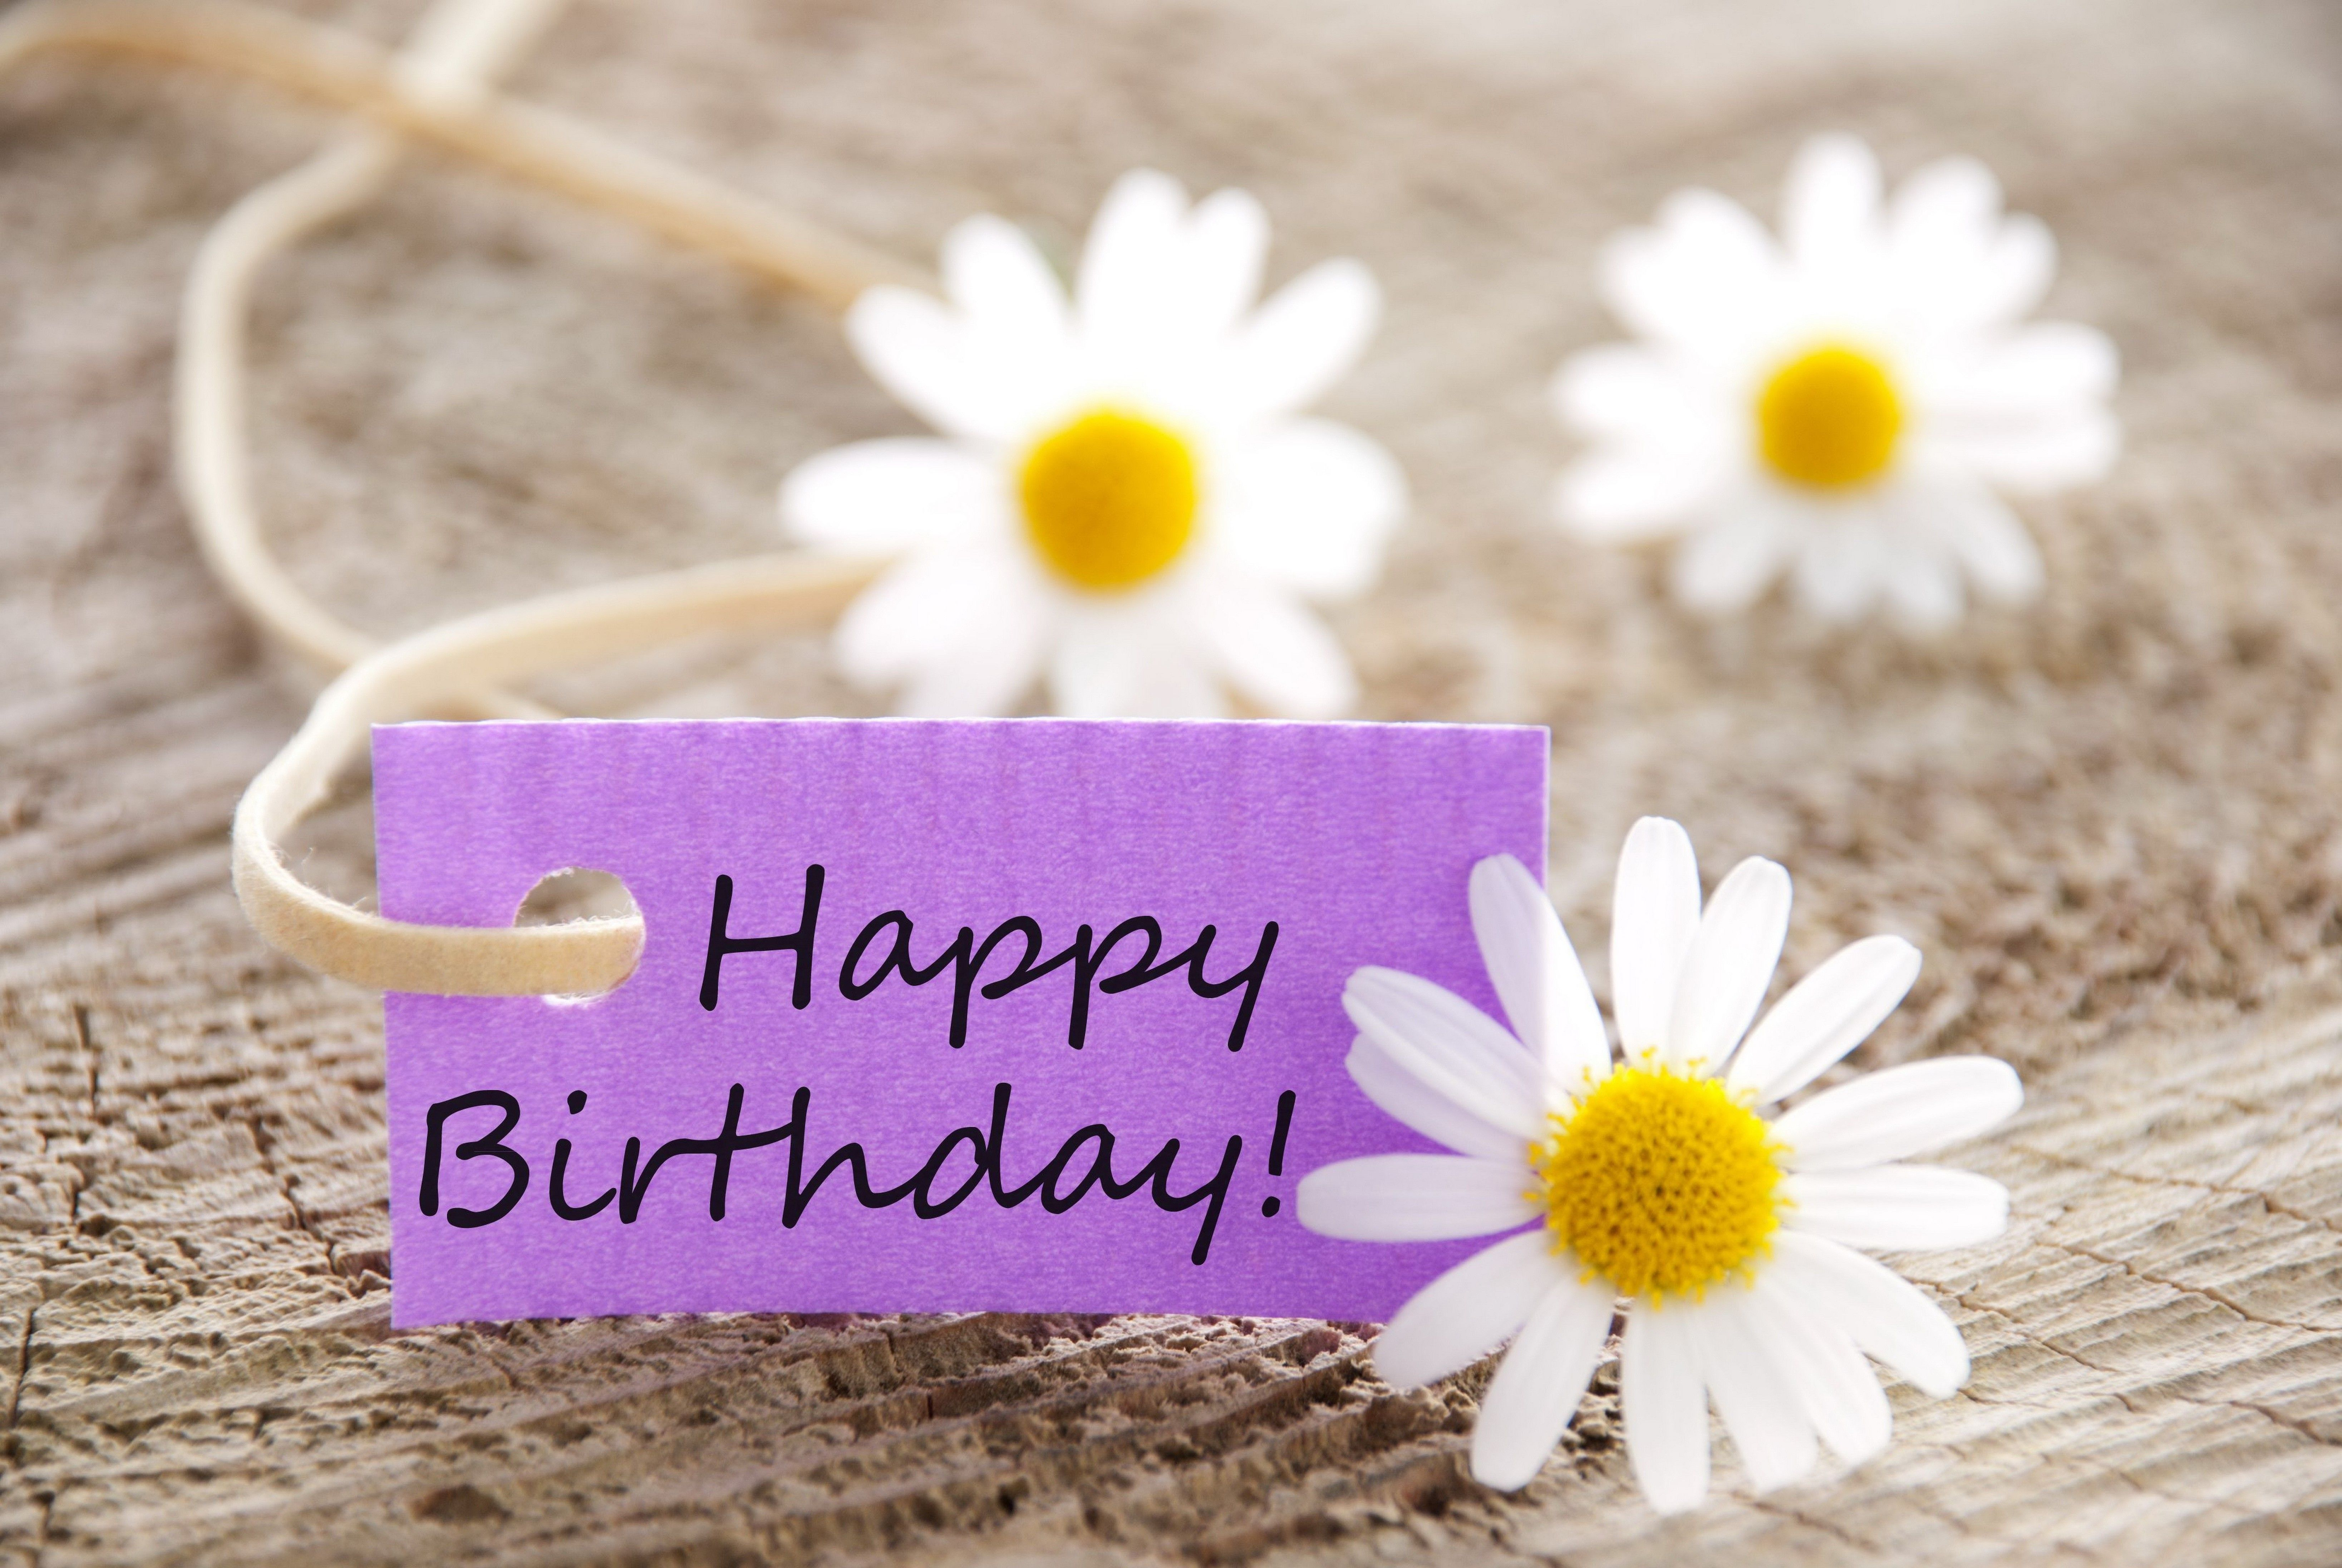 Hd wallpaper birthday - Happy Birthday Wallpaper Hdwplan Hd Wallpapers Pinterest Happy Birthday Wallpaper Hd Wallpaper And Wallpaper